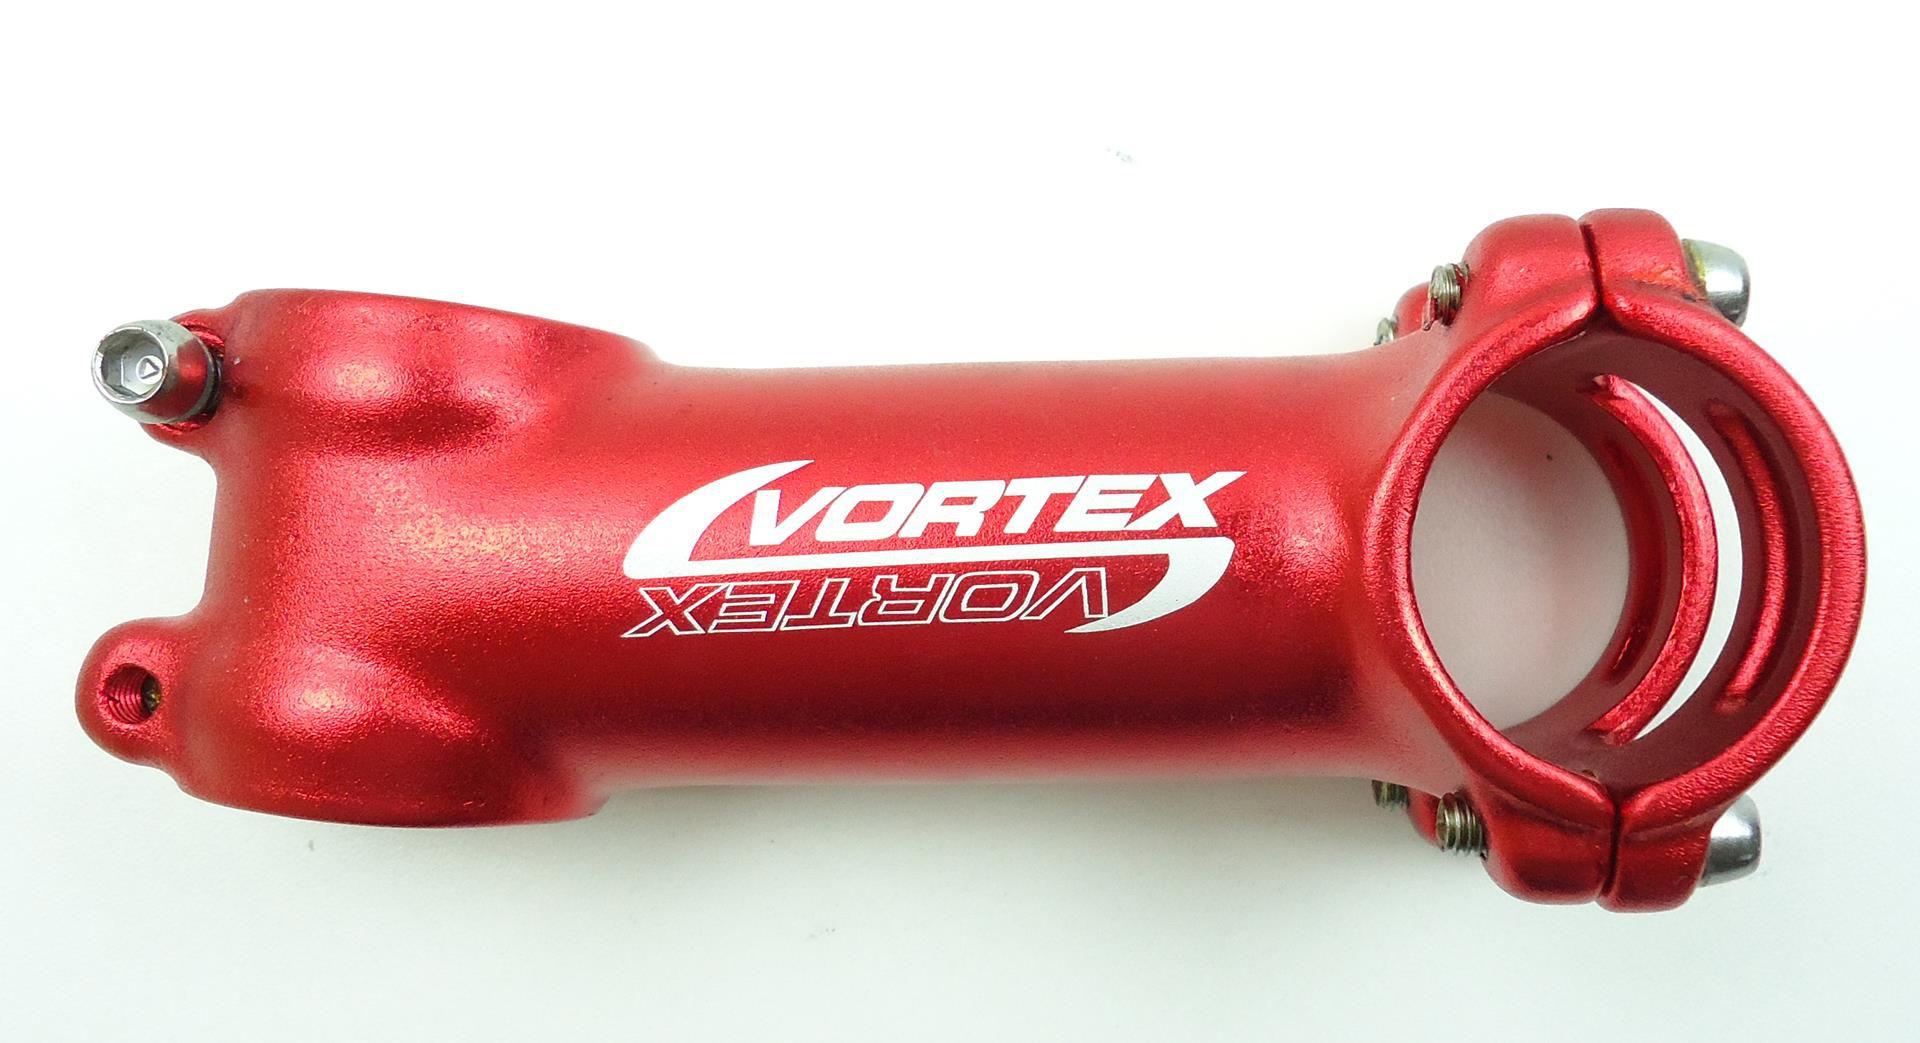 Kit MTB Vortex Guidão 710mm + Mesa 100mm 31.8mm em Aluminio Cor Vermelha